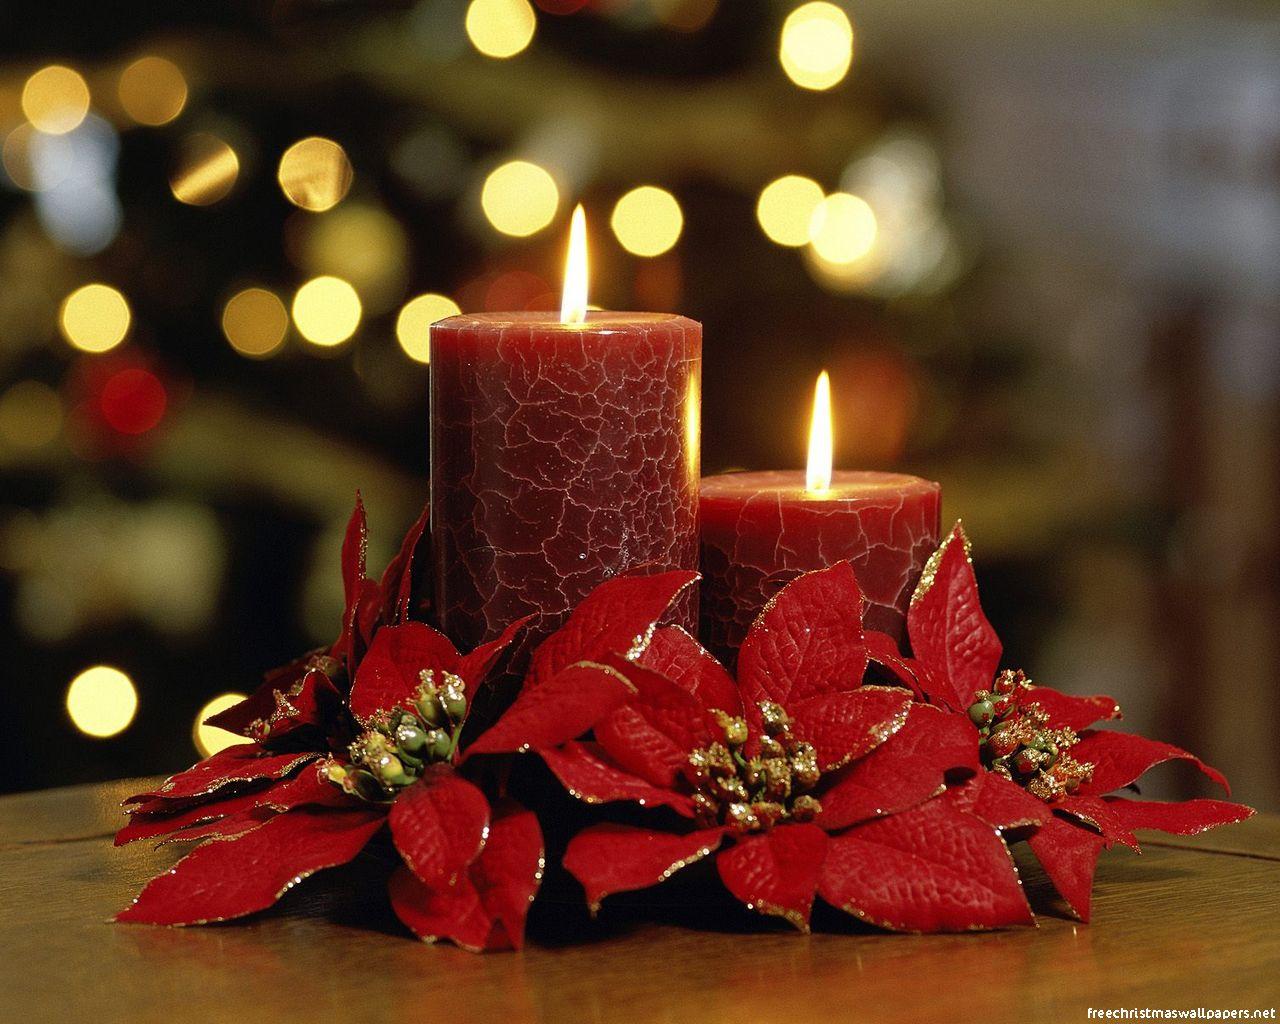 http://3.bp.blogspot.com/_-hMaVShO11c/TRUjNk5NQqI/AAAAAAAAAP0/C3Y8se4zIPo/s1600/christmas-candles-wallpaper-005.jpg